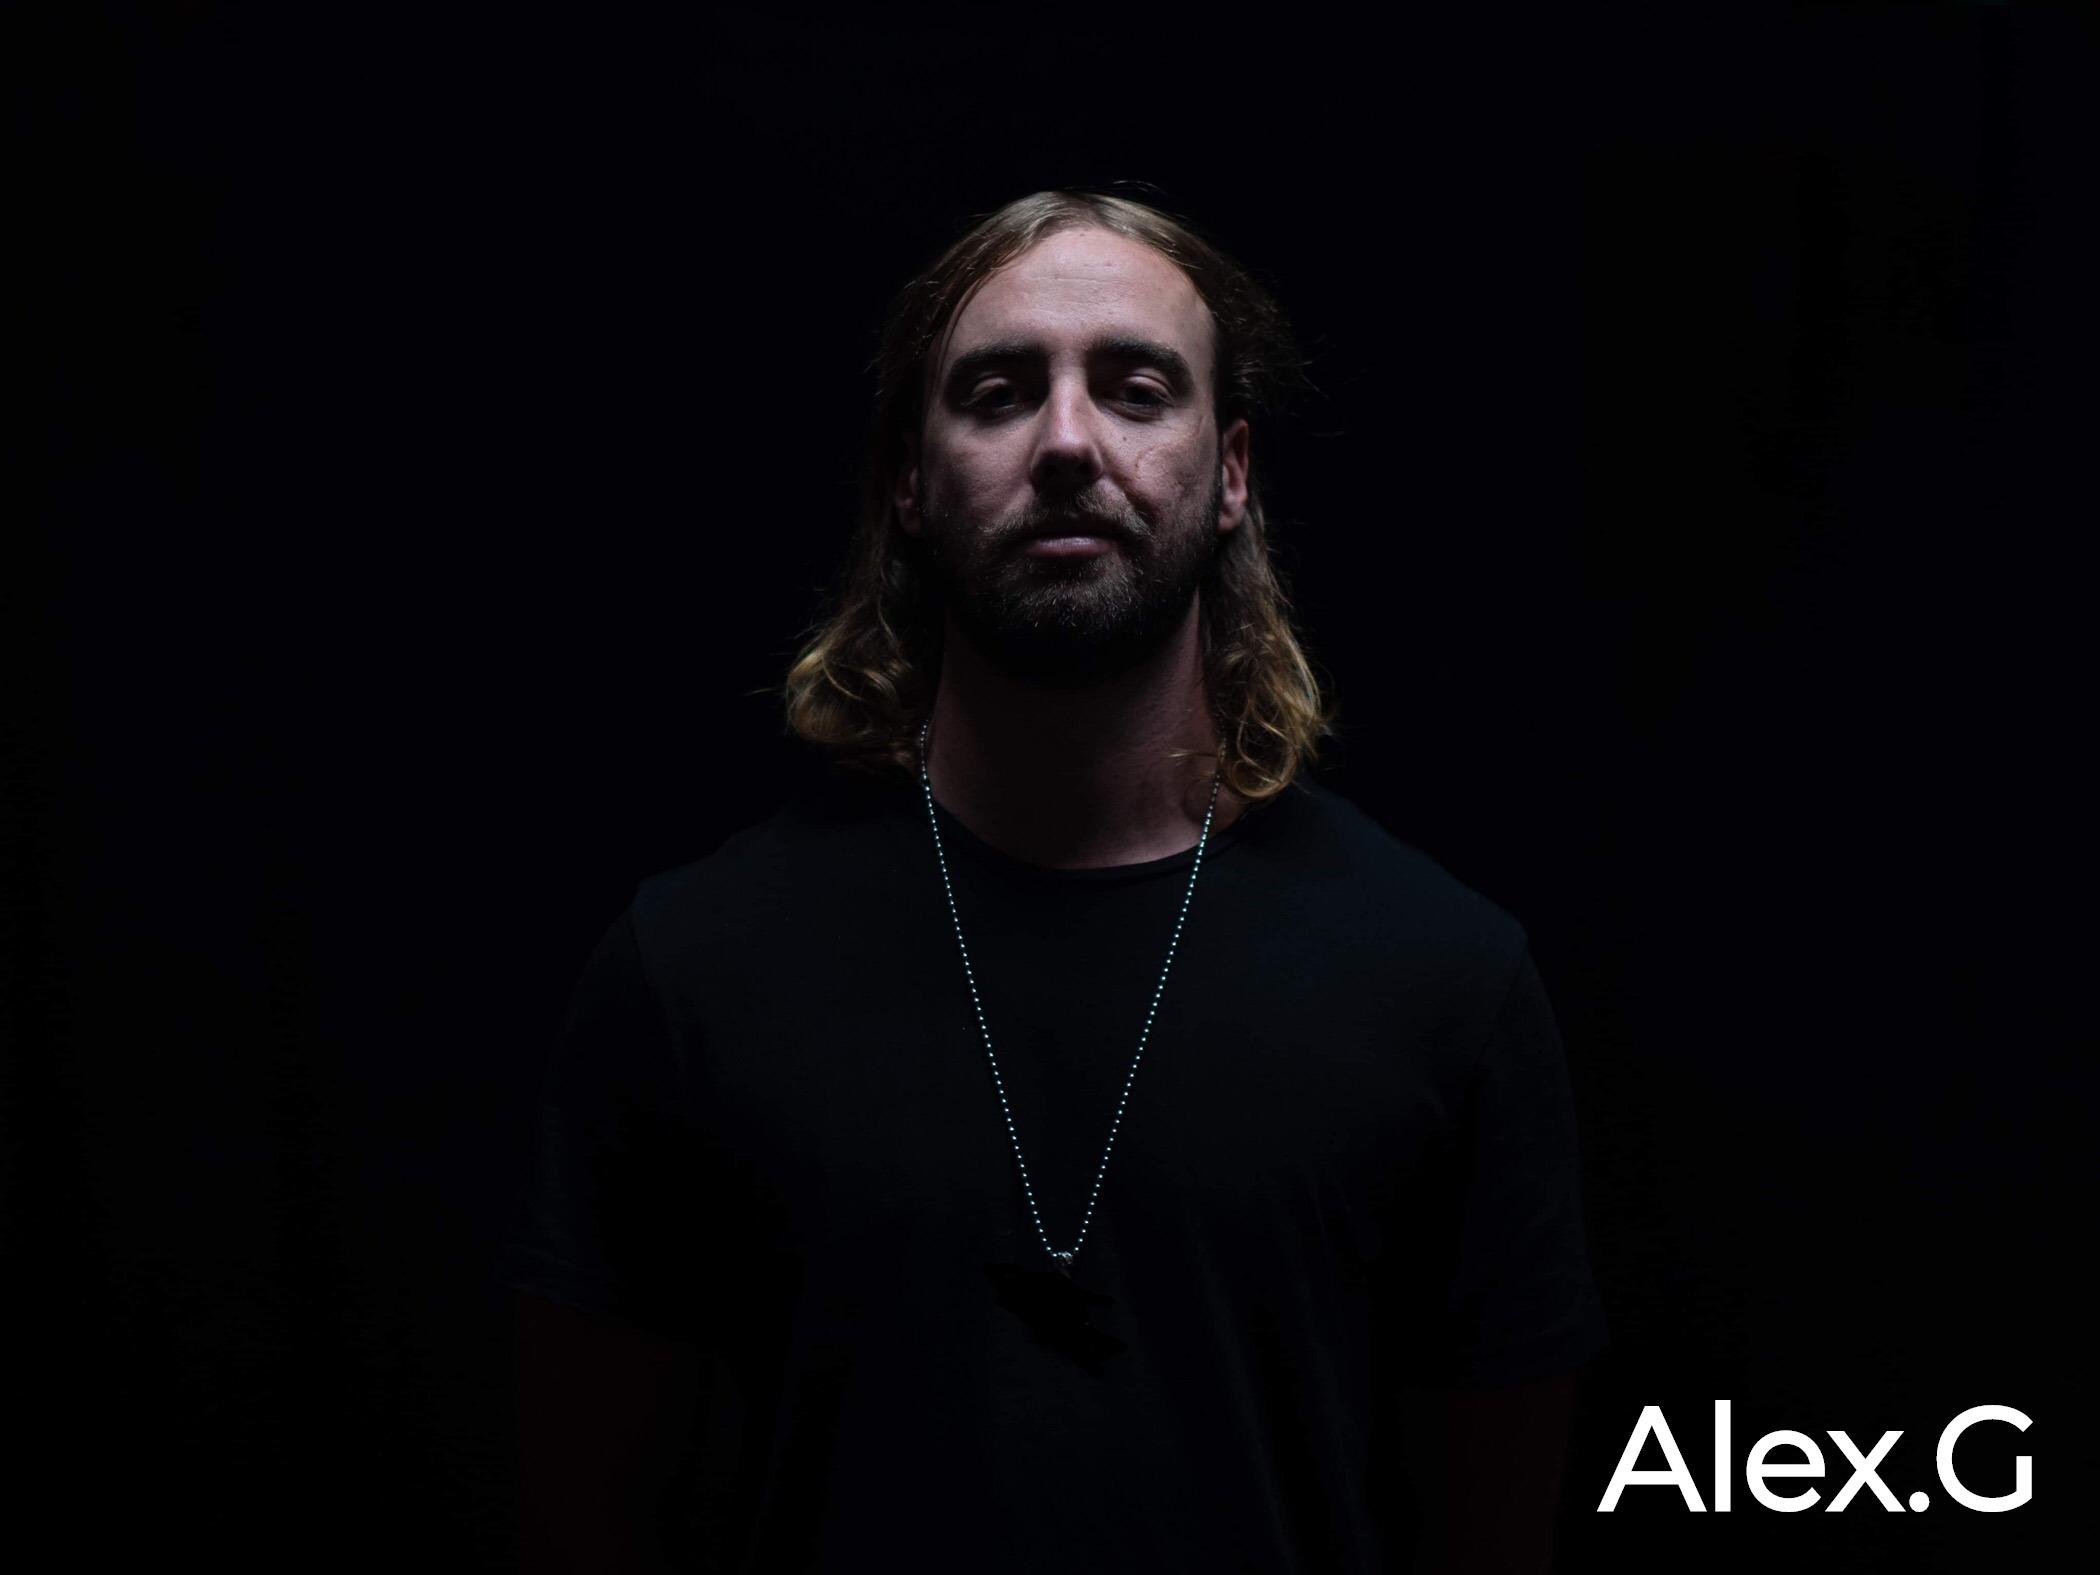 Alex.G